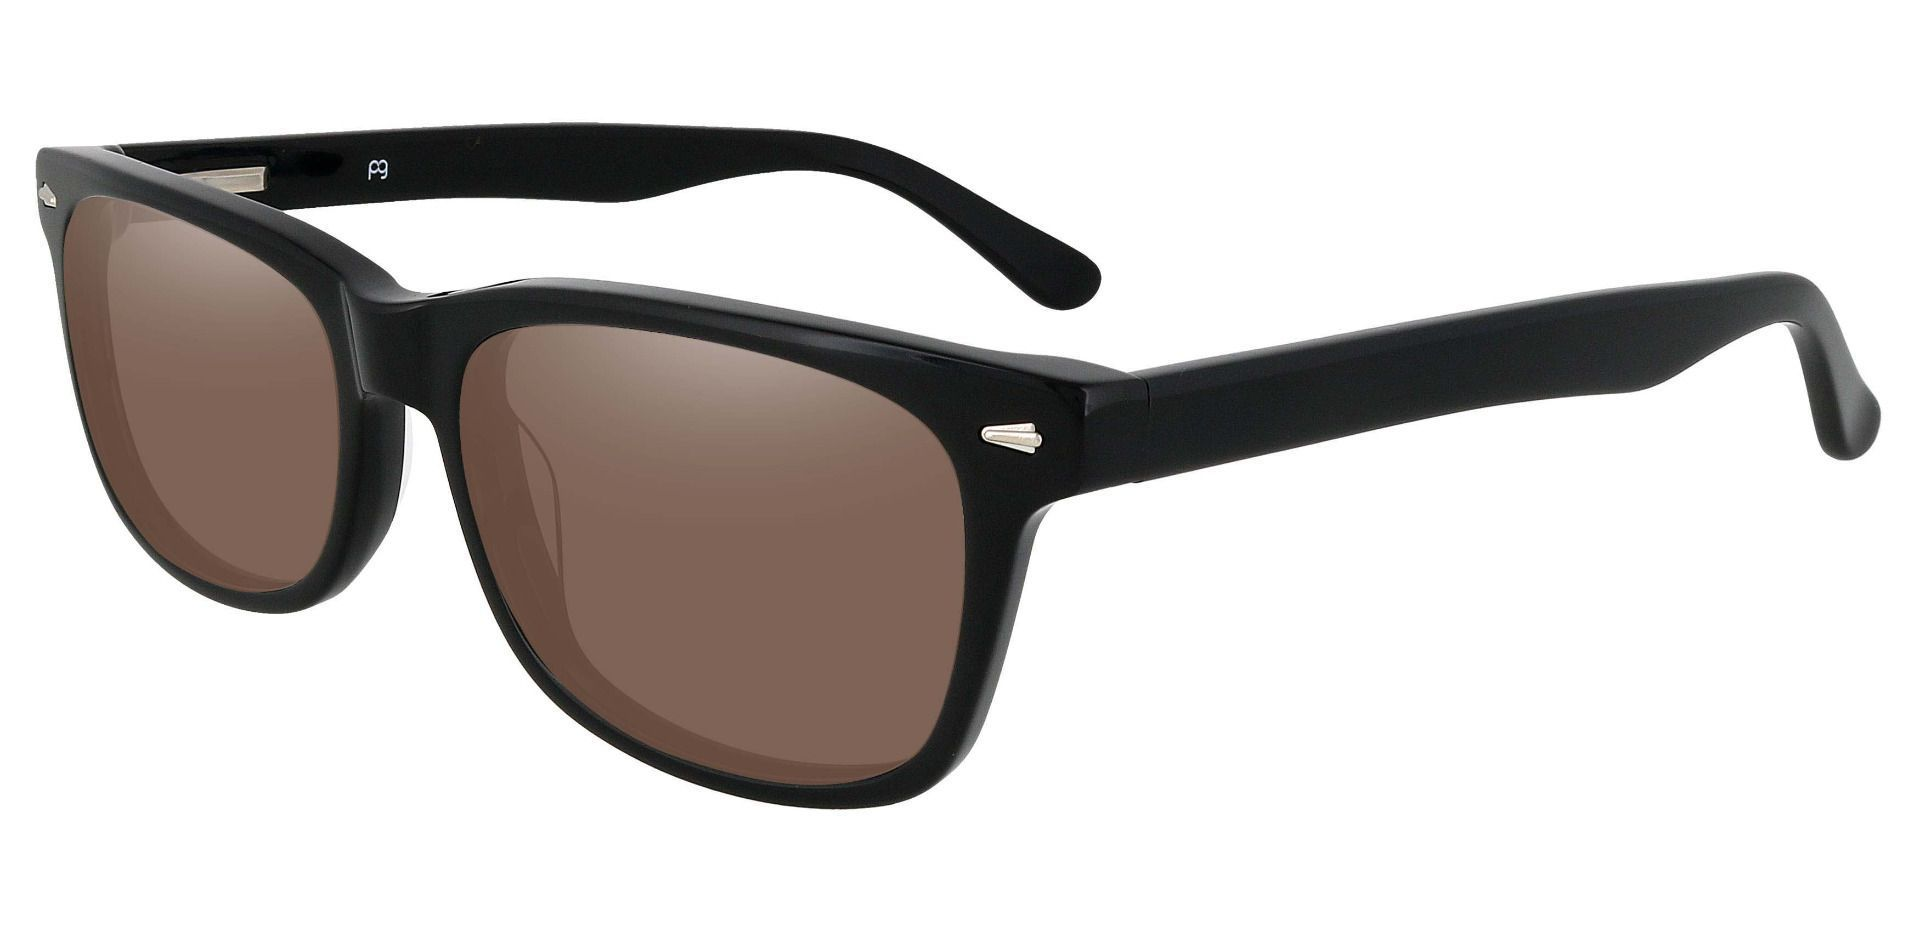 Hendrix Rectangle Reading Sunglasses - Black Frame With Brown Lenses